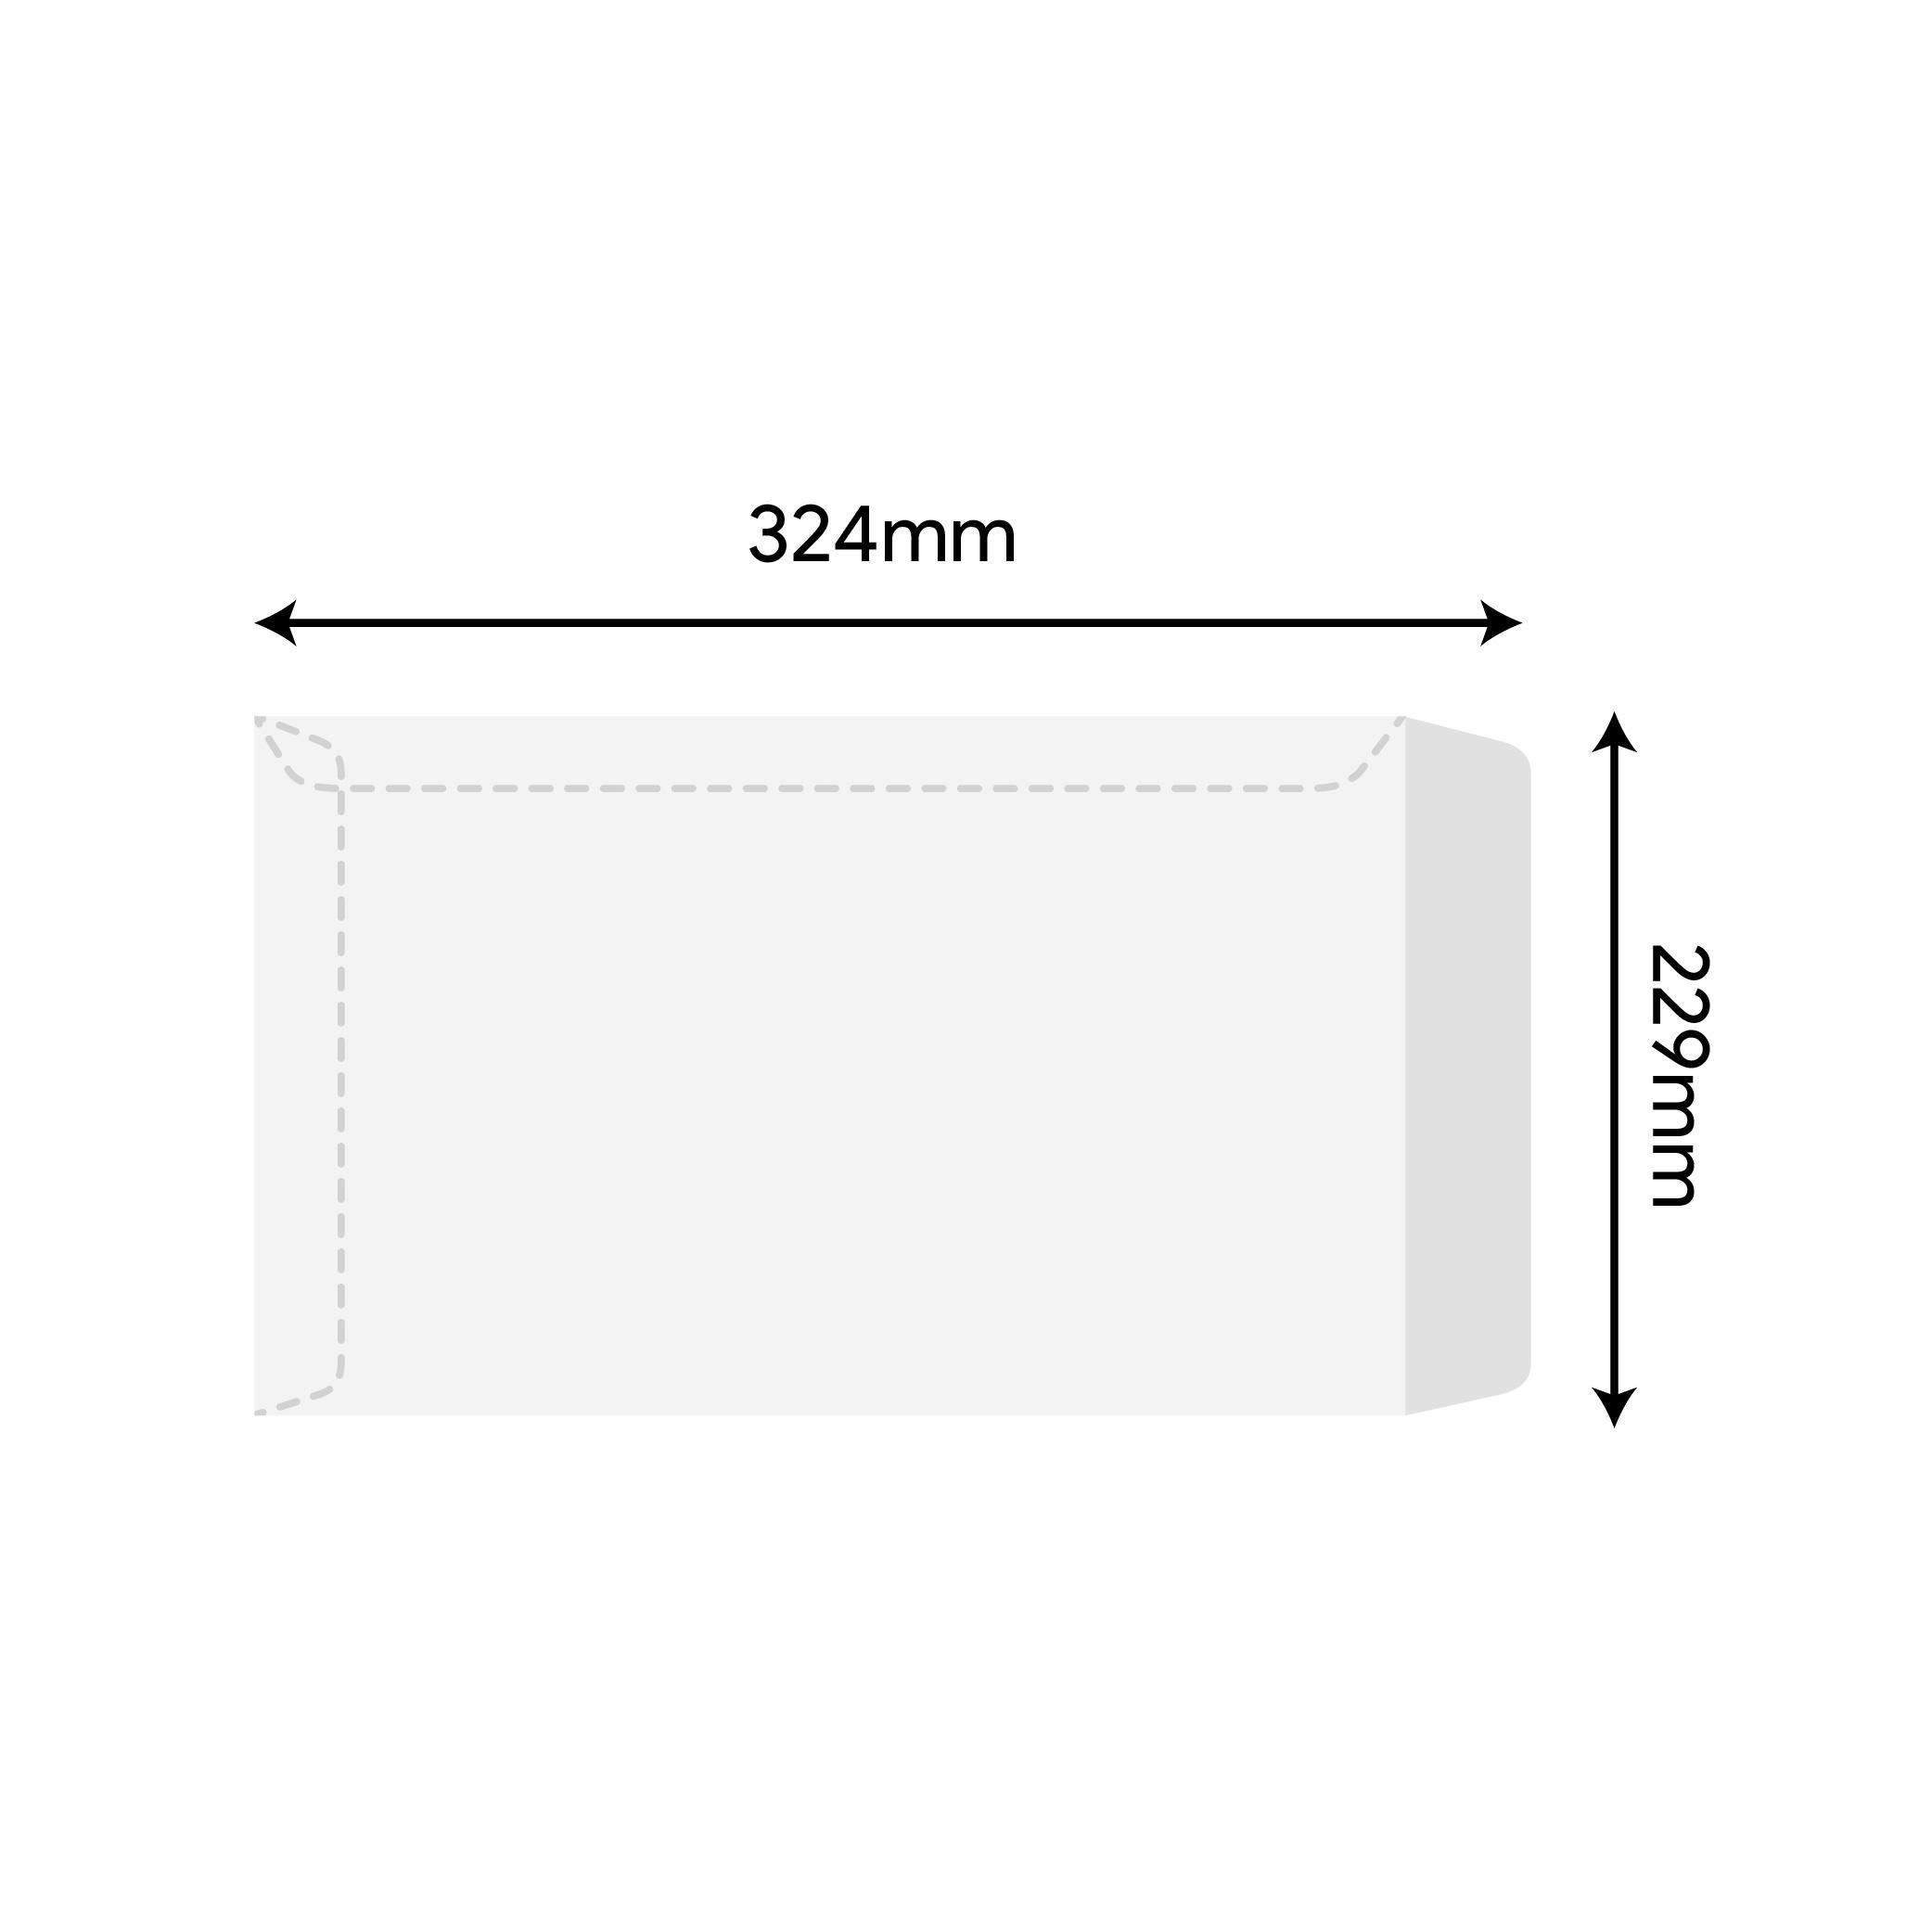 Envelope Templates-09